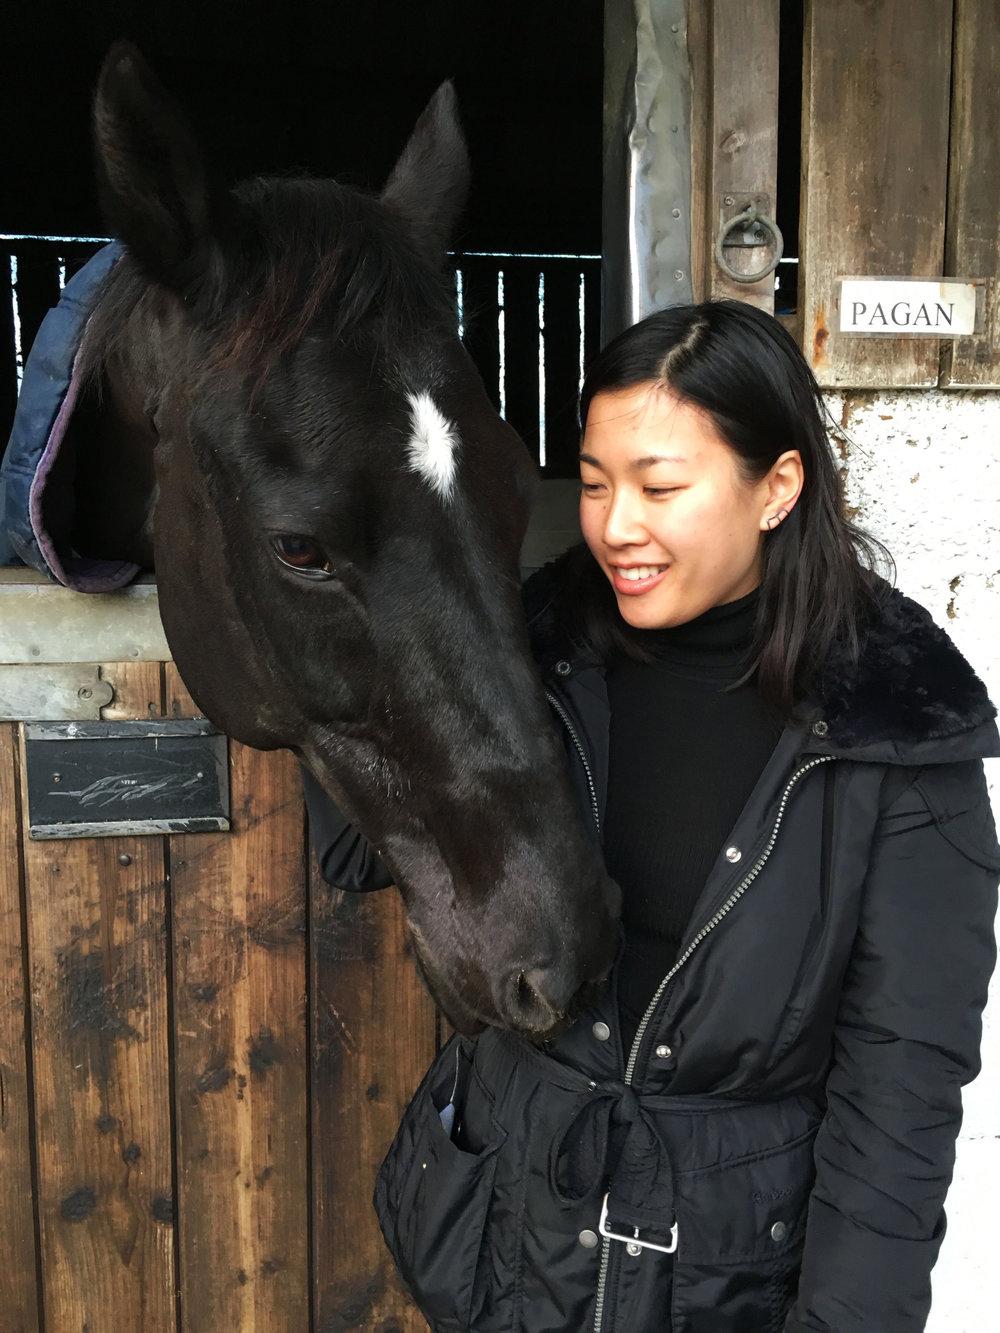 Lozidaze_Cotswolds_Horse_02